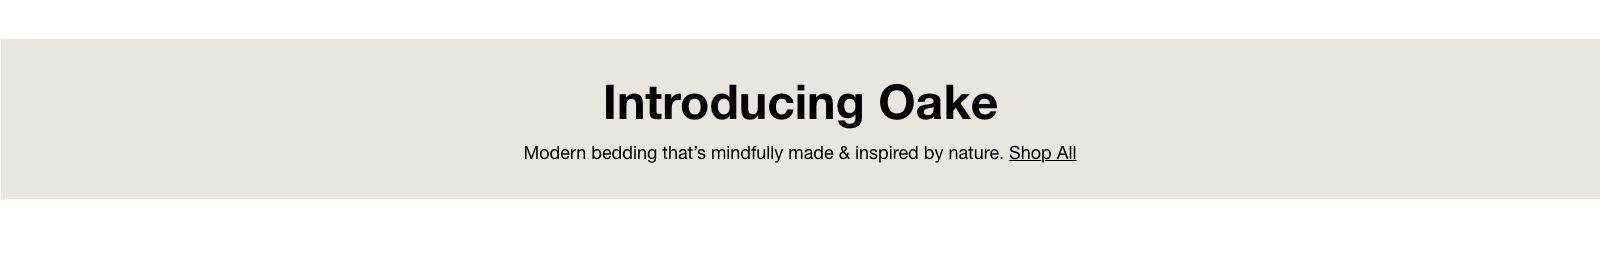 Introducing Oake